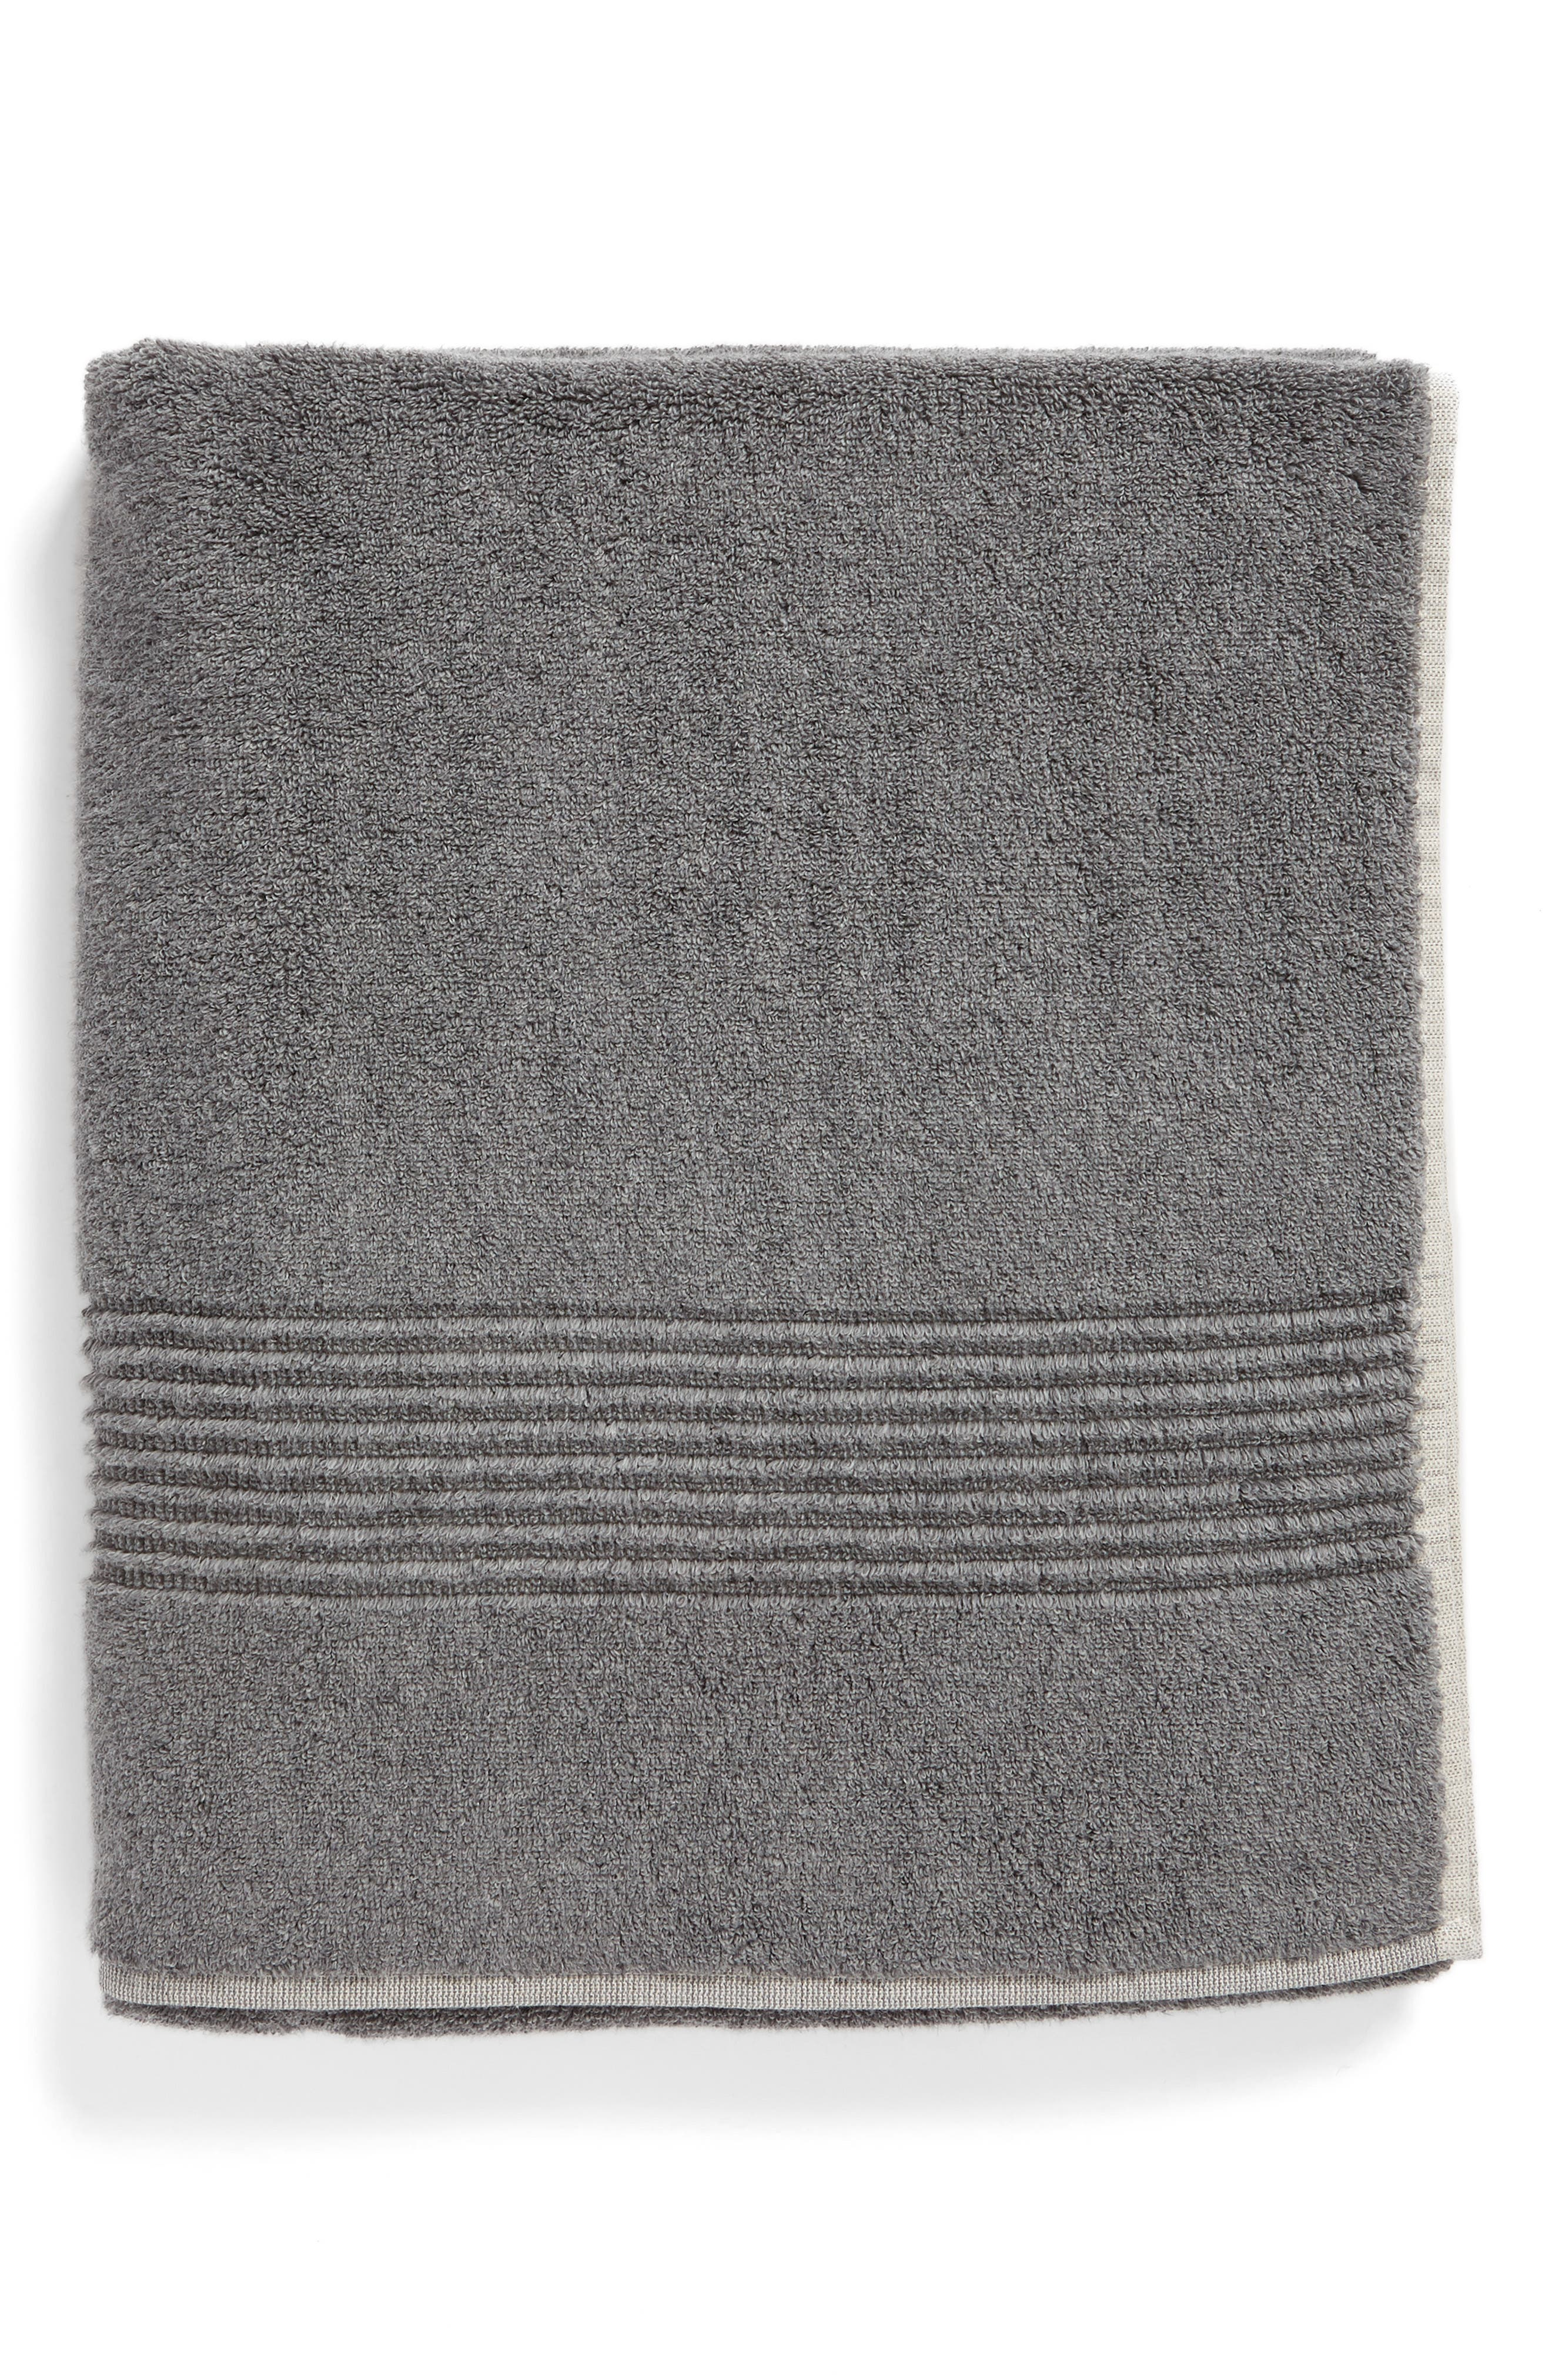 Organic Hydrocotton Bath Towel,                             Main thumbnail 1, color,                             GREY PEARL